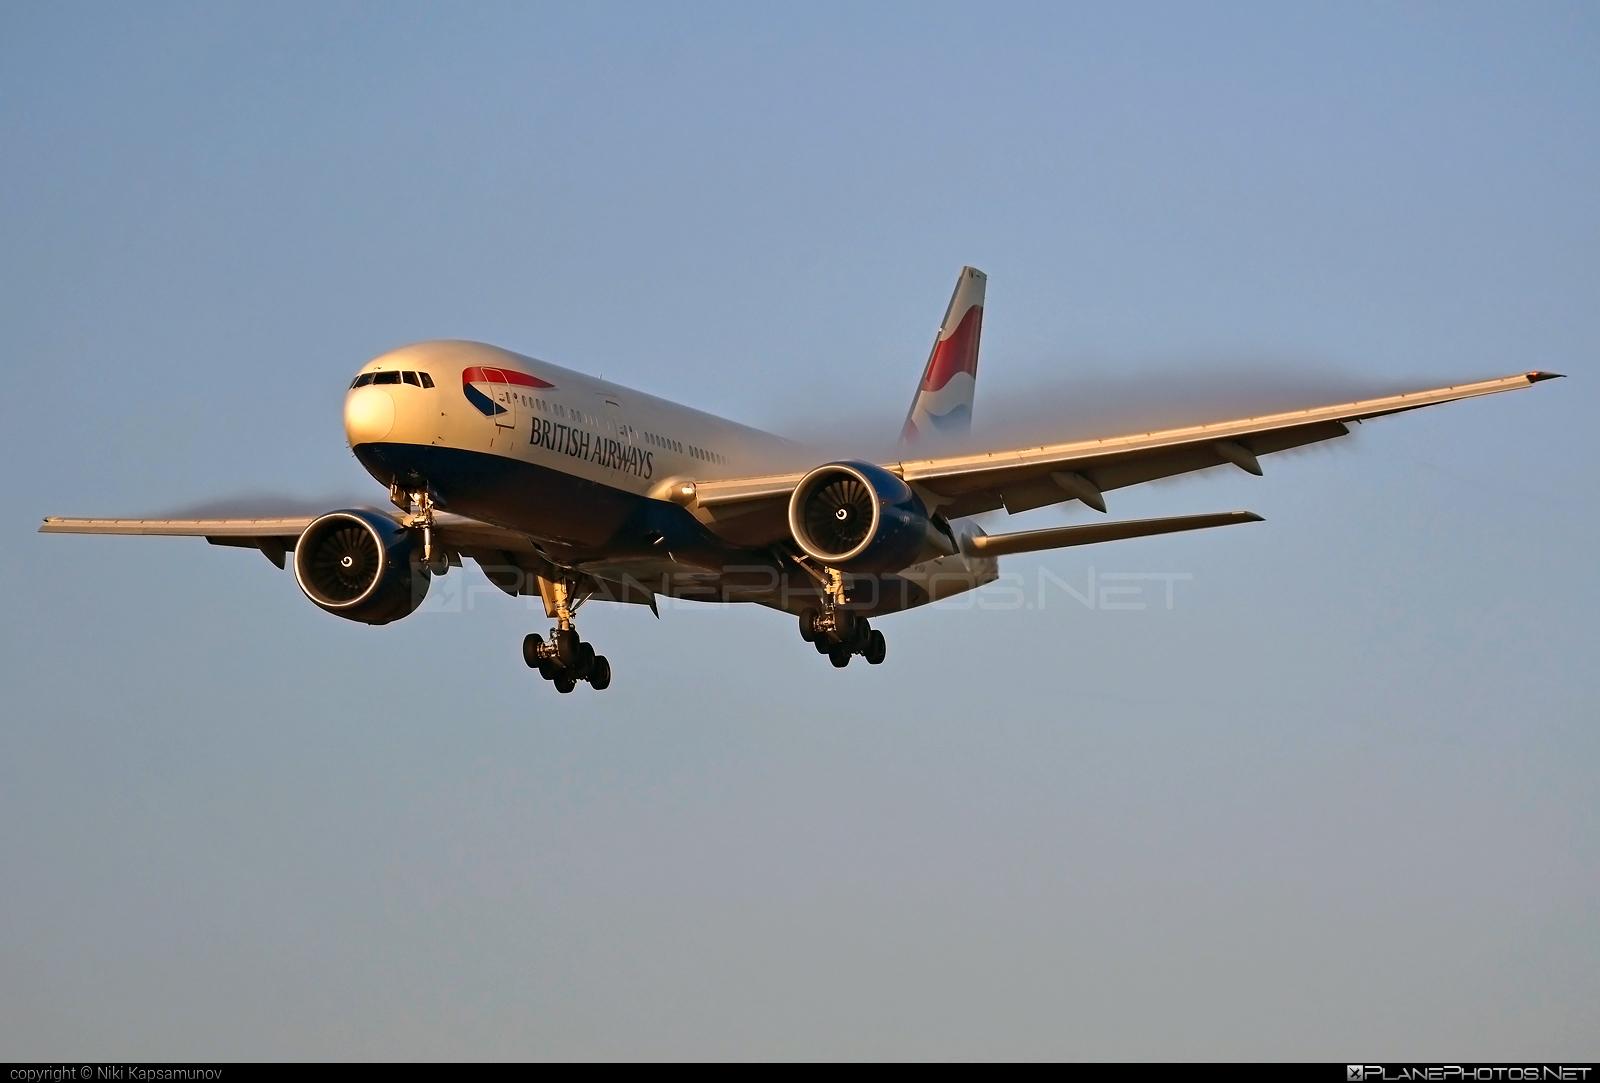 Boeing 777-200ER - G-VIIW operated by British Airways #b777 #b777er #boeing #boeing777 #britishairways #tripleseven